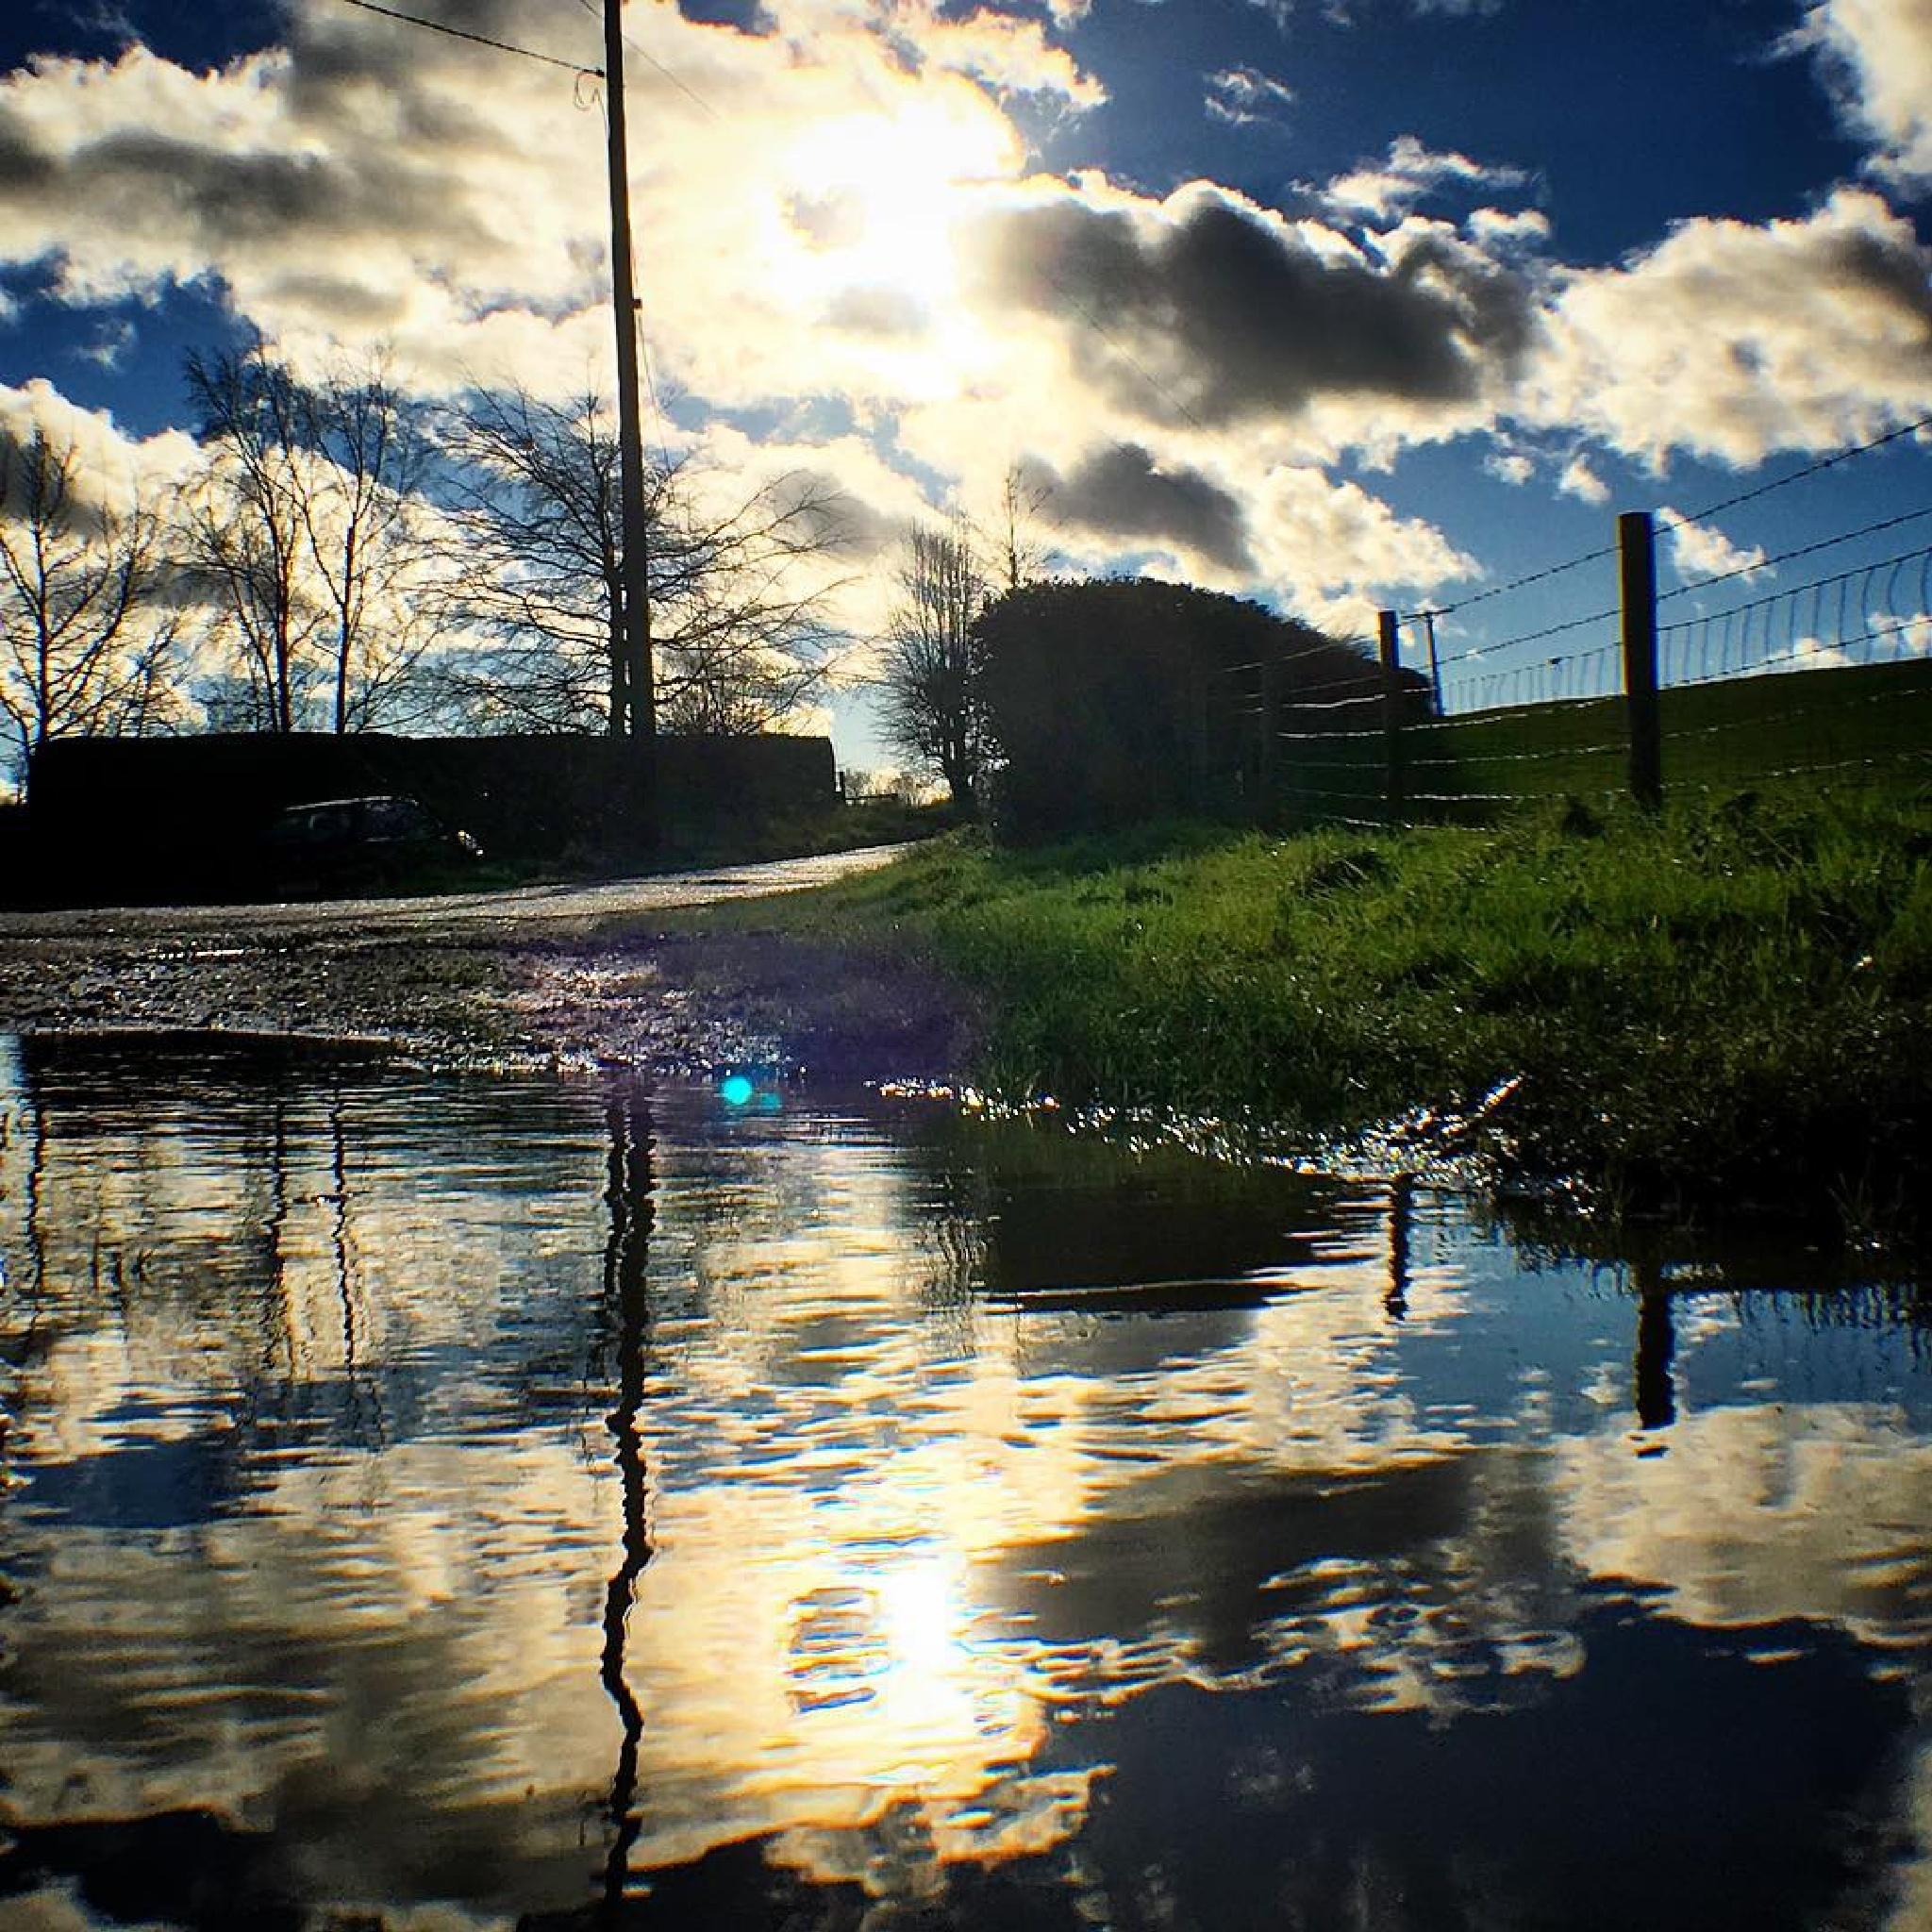 Winter sunshine breaking through clouds over Bramley farmland by beaniedee